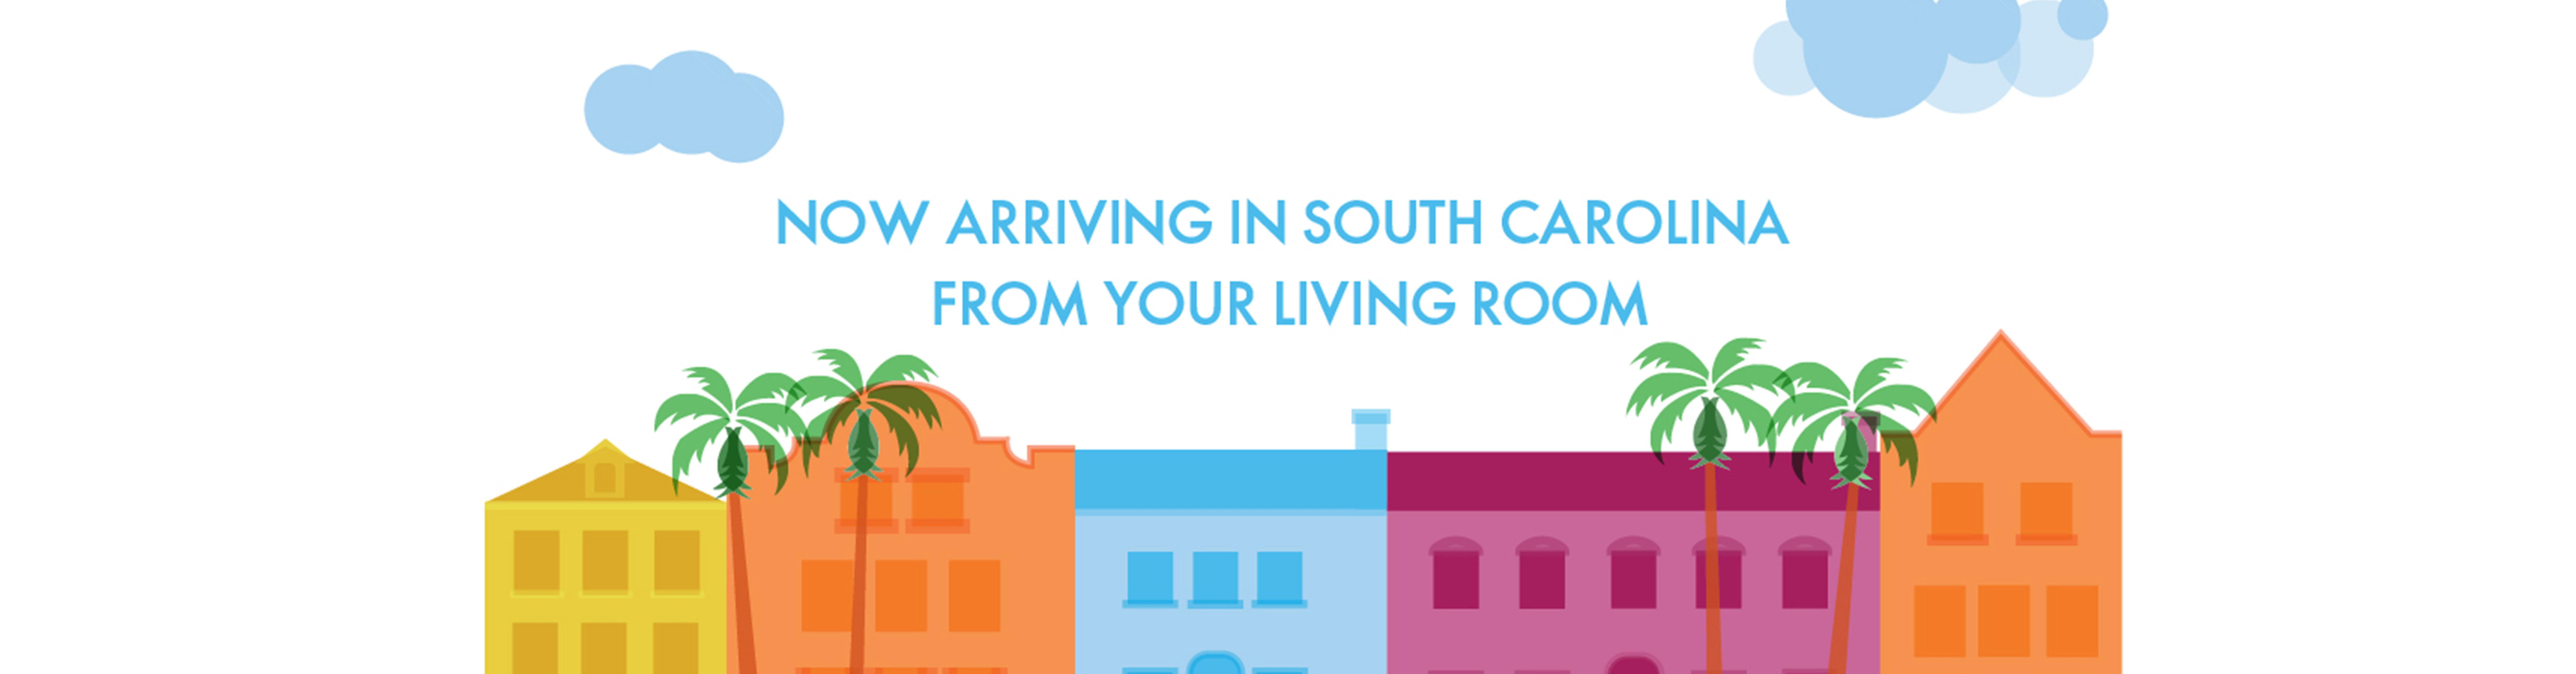 South Carolina blog header